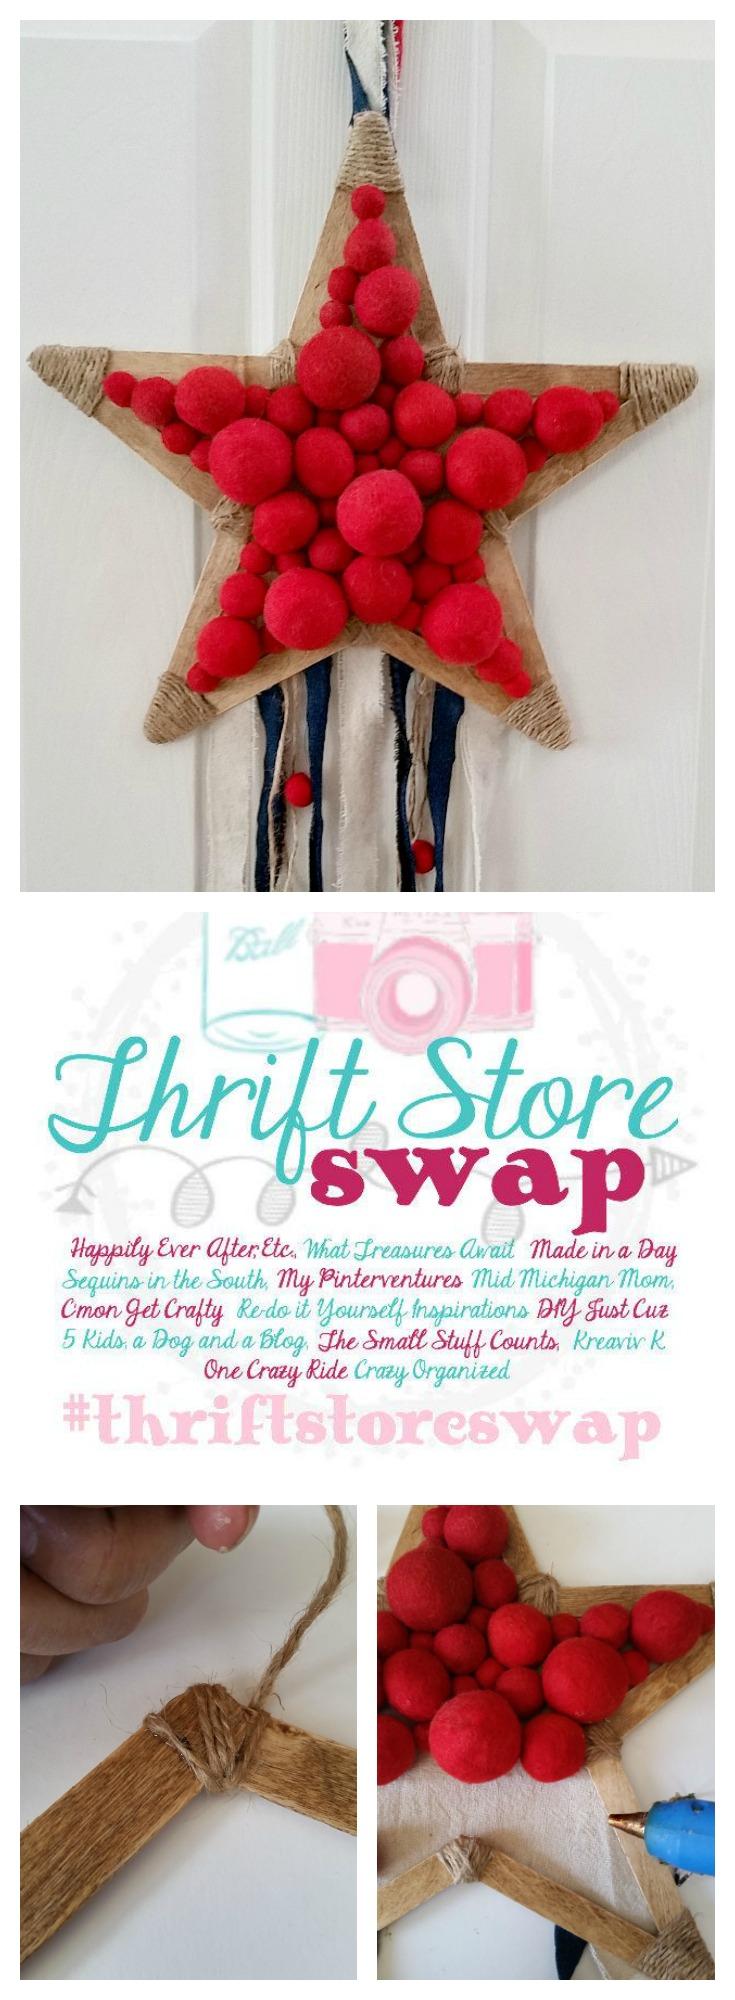 Thrift Store Swap Patriotic Star Wreath